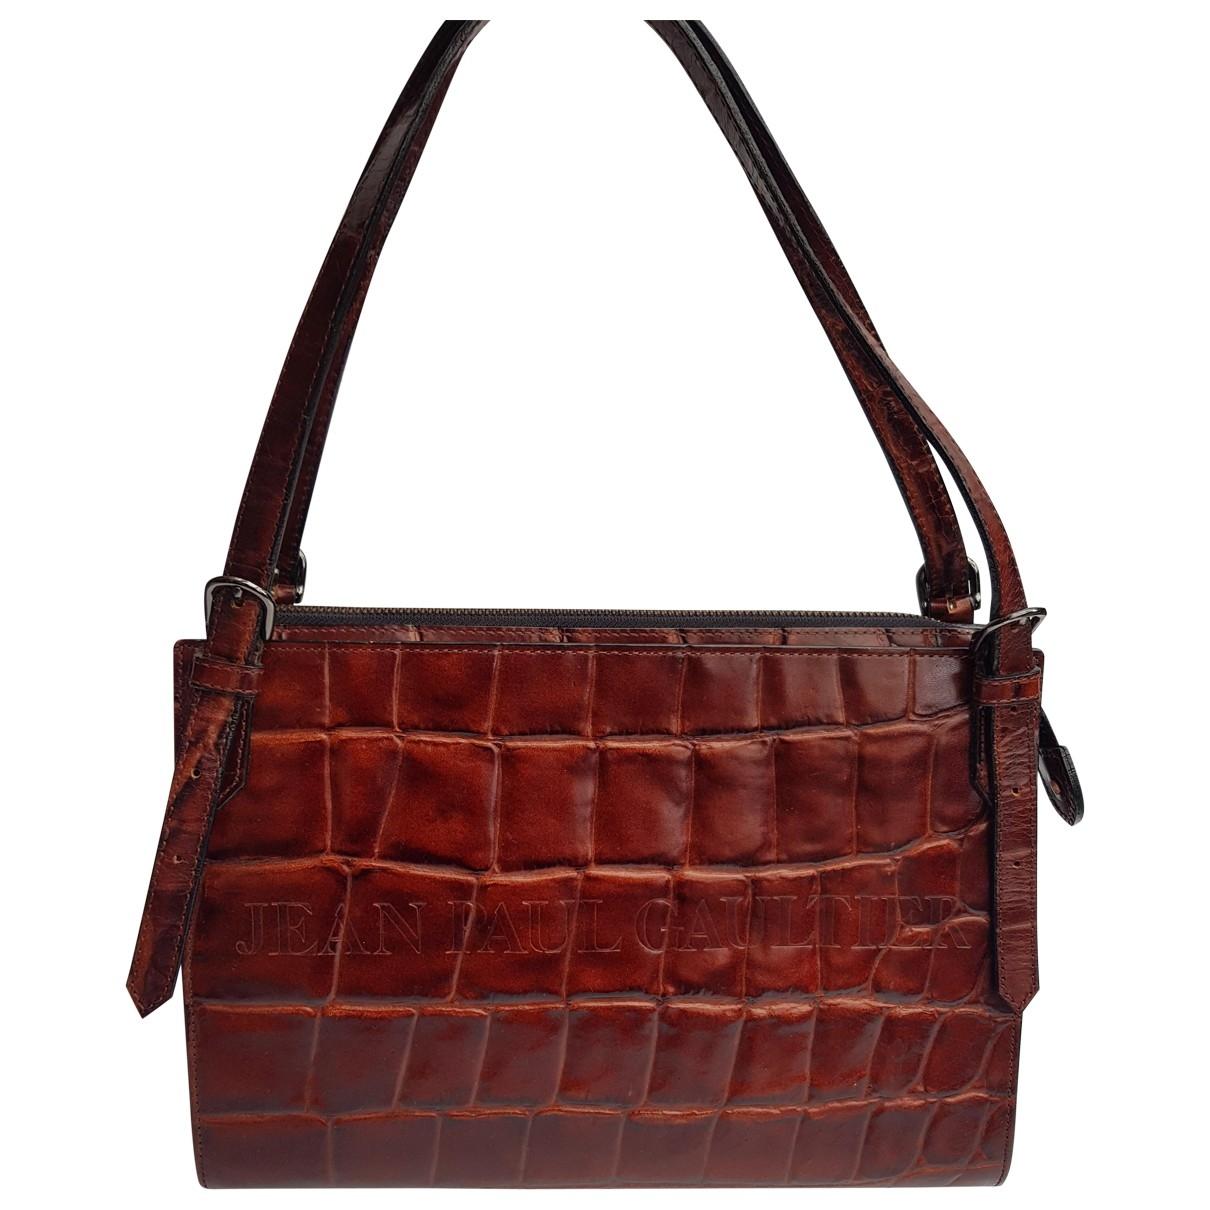 Jean Paul Gaultier \N Handtasche in  Braun Leder